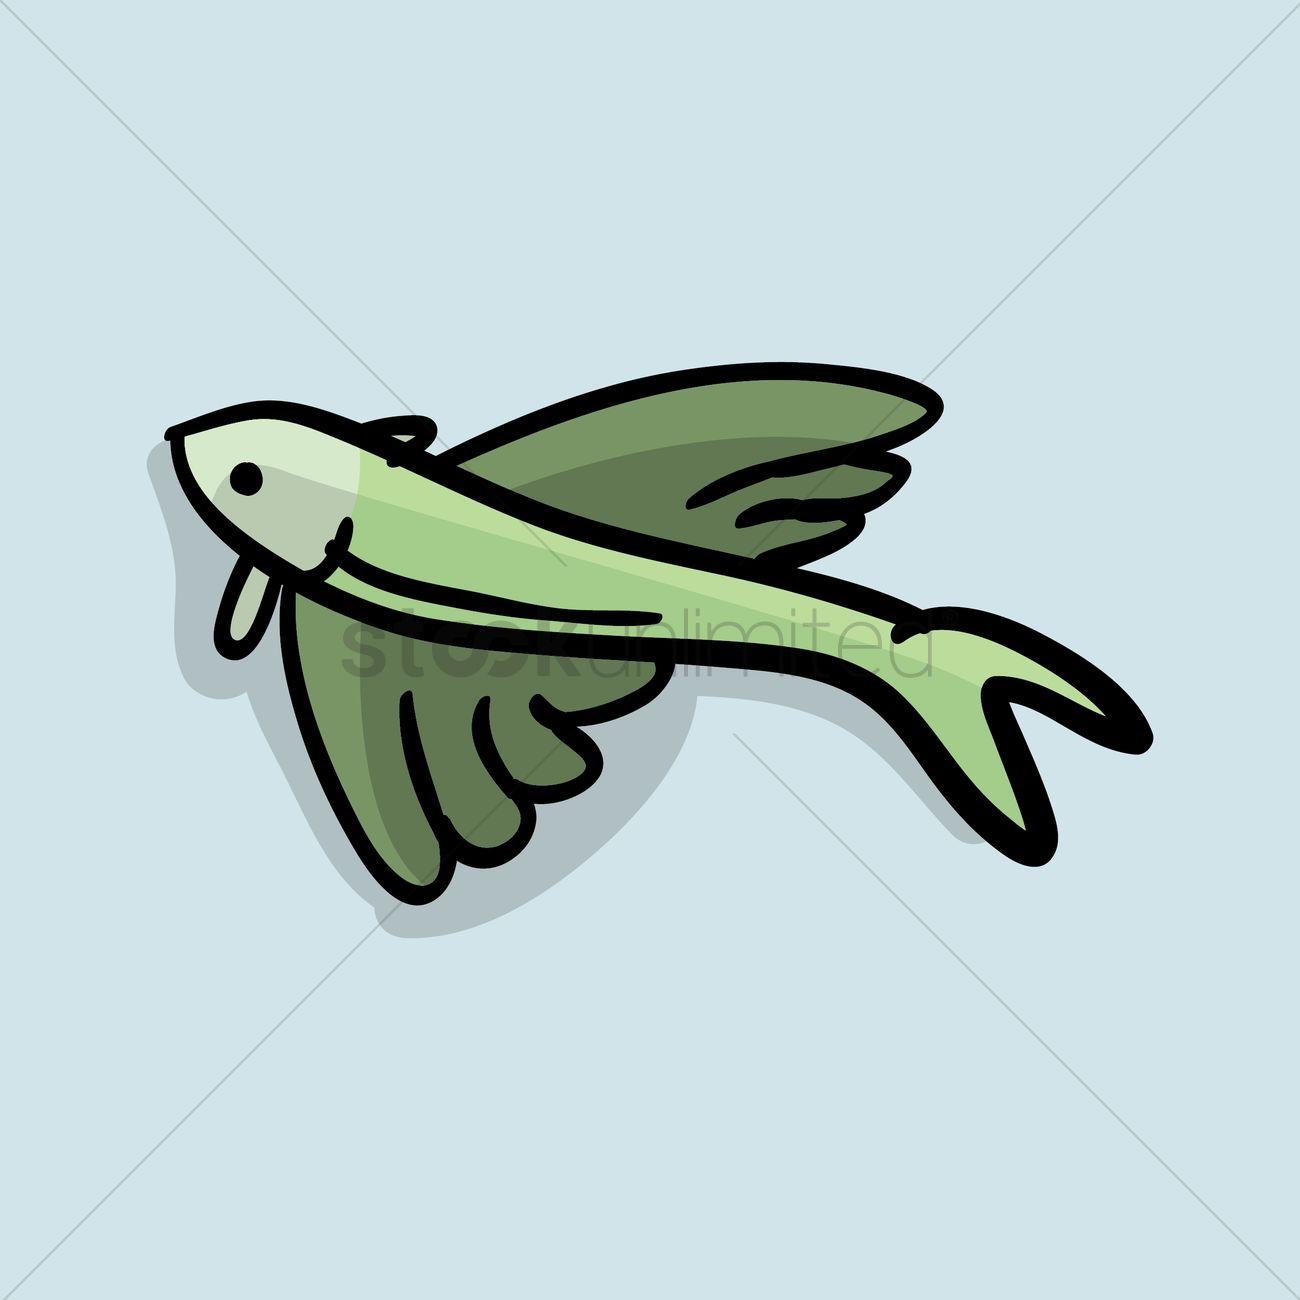 Flying Fish Cartoon Vector Image 1420002 Stockunlimited